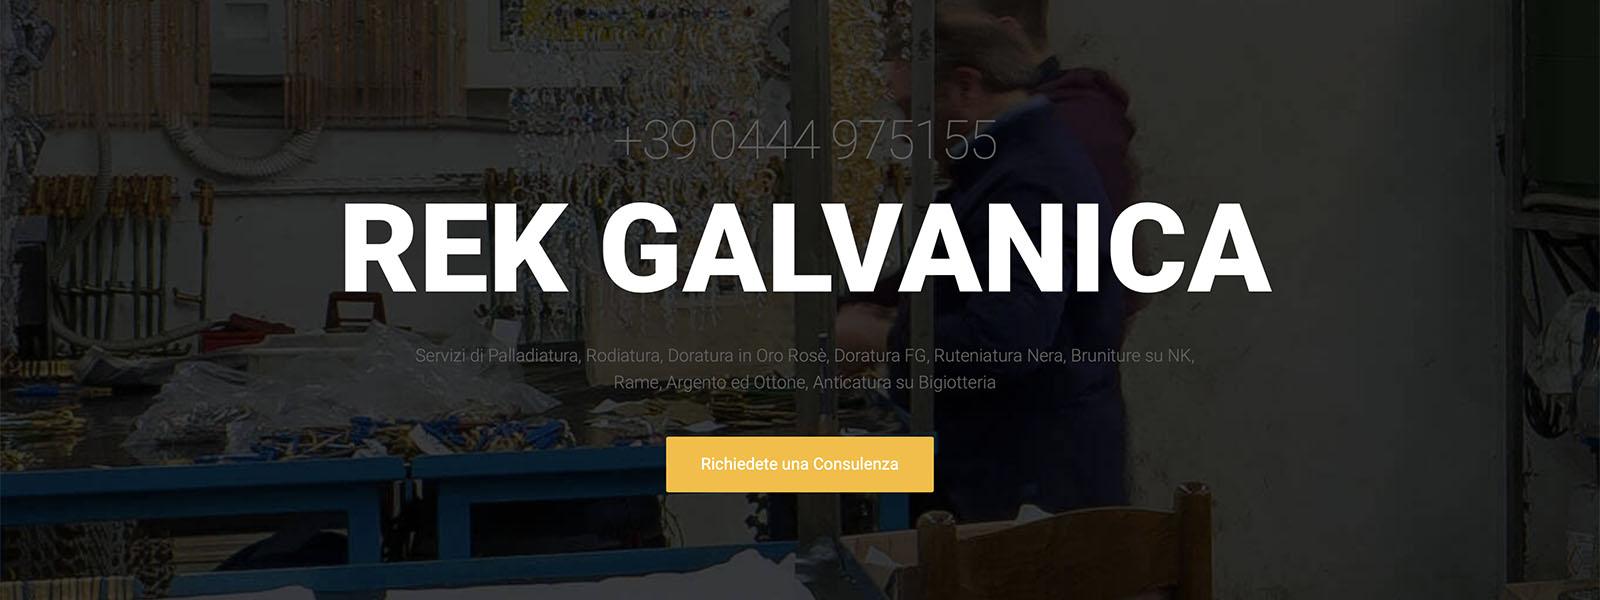 Sito Web Rek Galvanica Snc